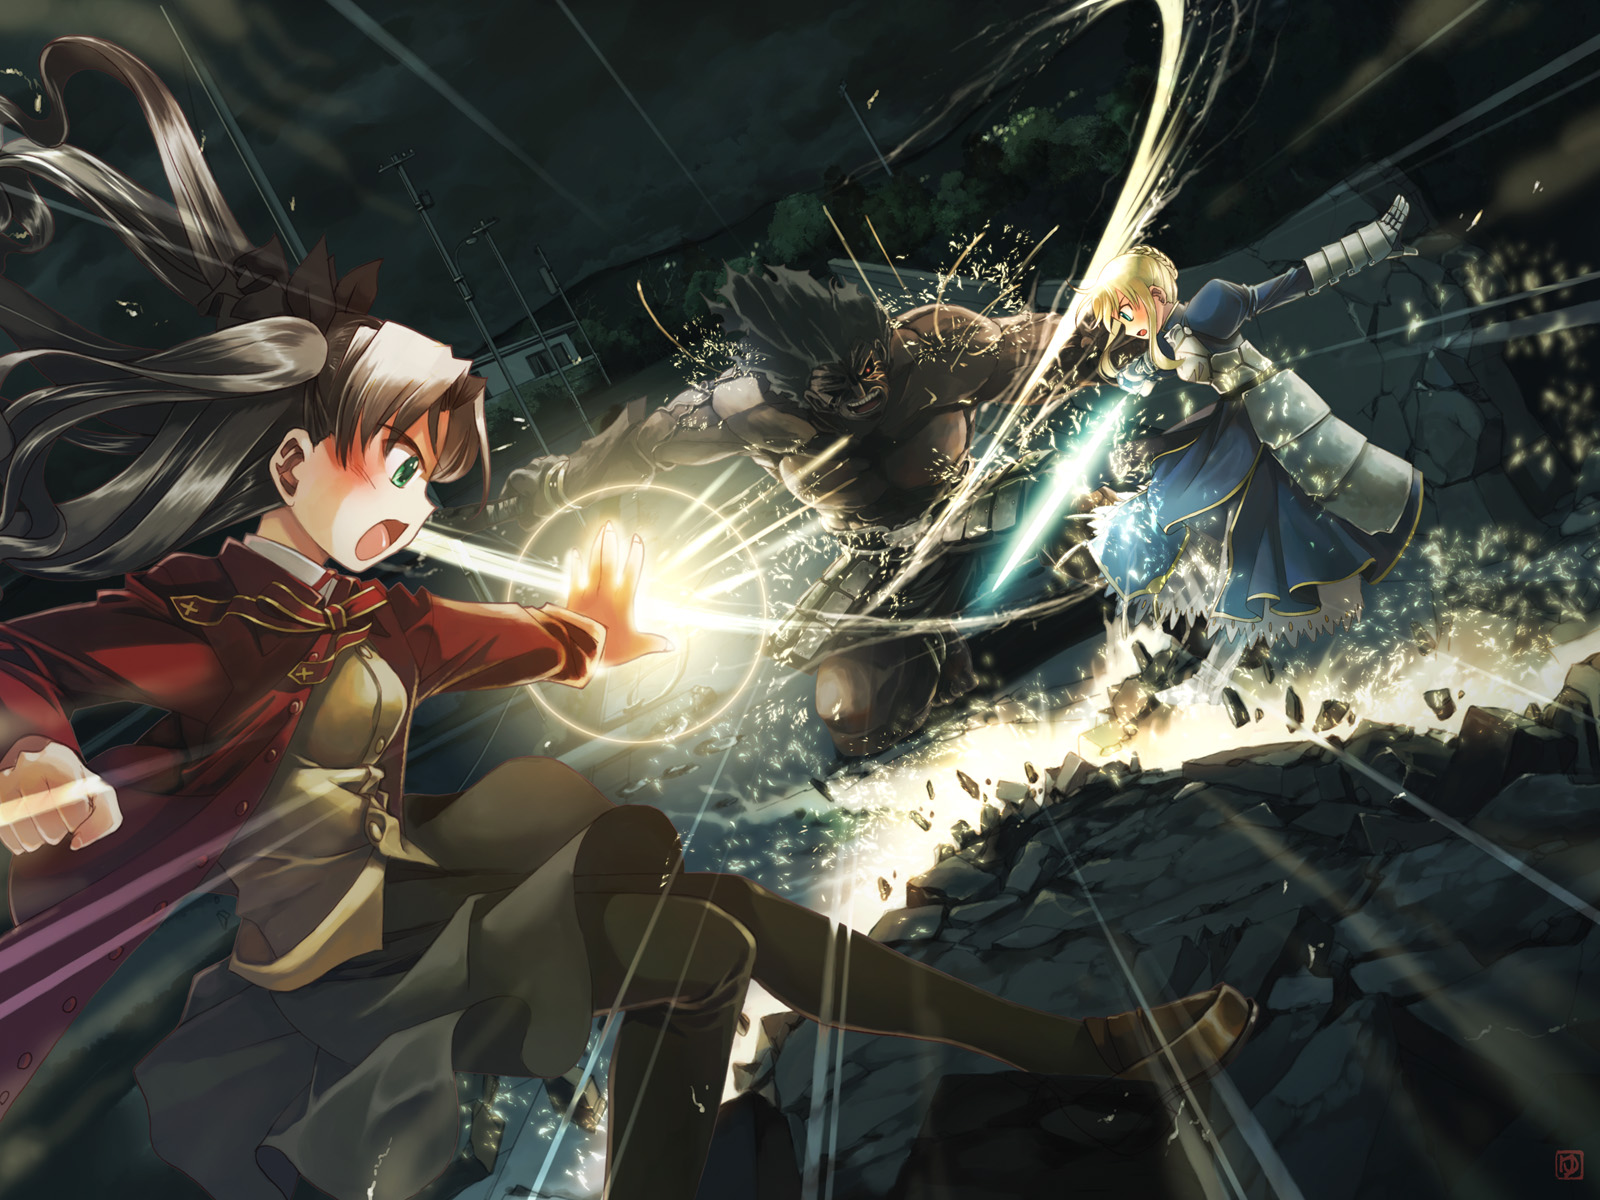 Rin Tohsaka Fate Zero Fate StayNight Black Armor Sword Girl Anime 1600x1200